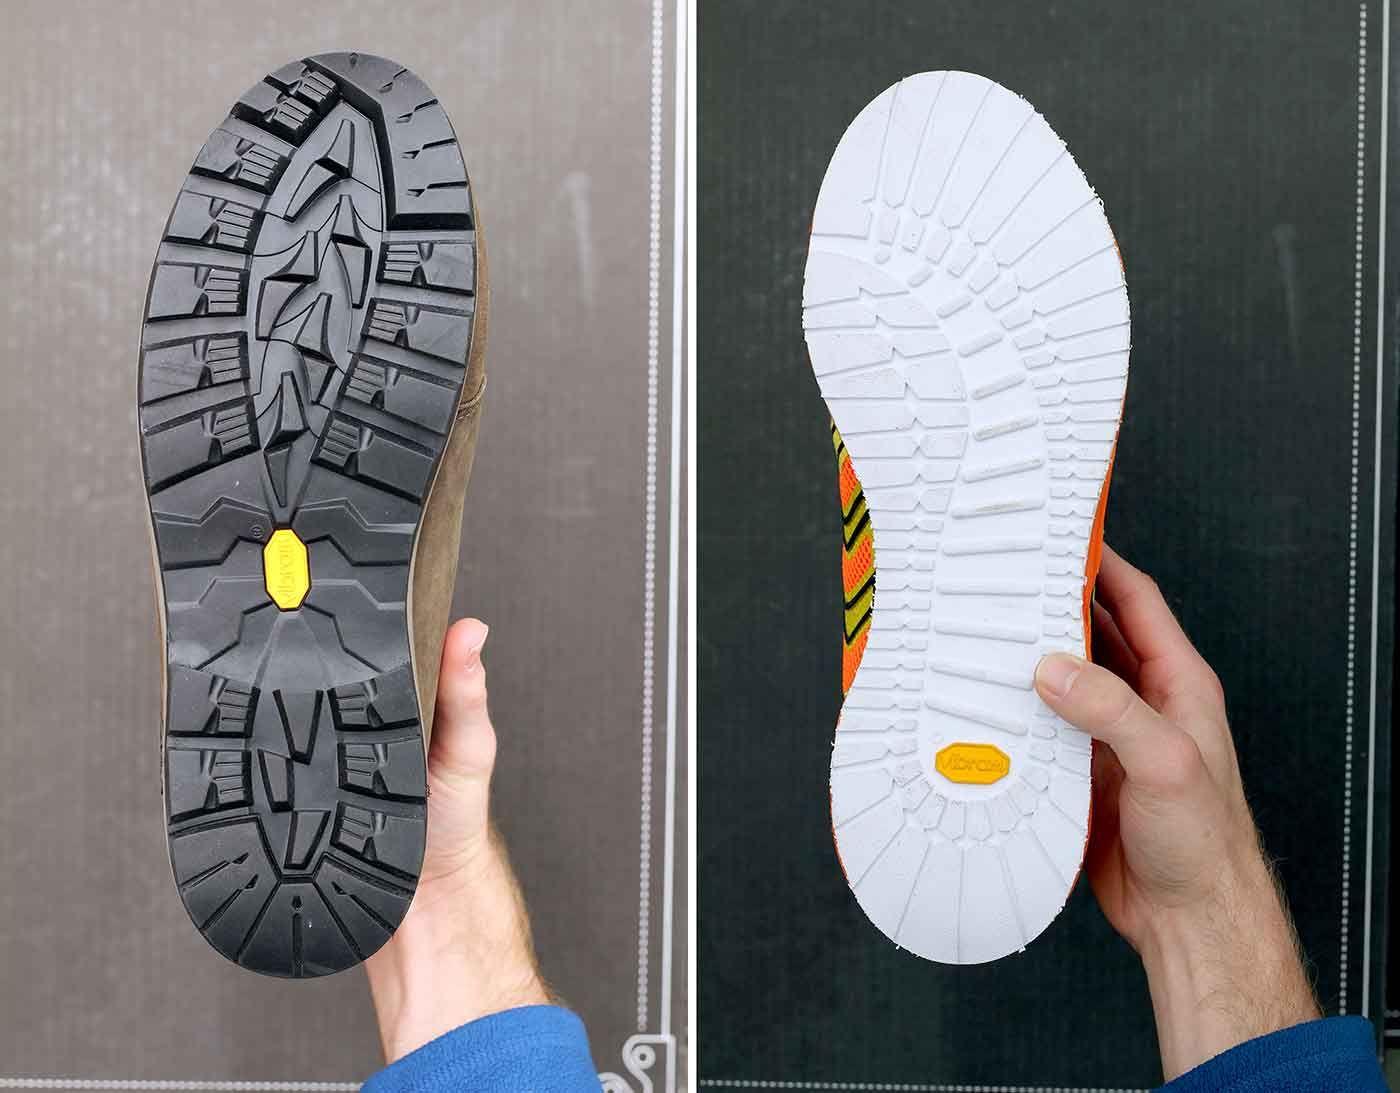 e7d594e6dfd Fresh Tread: New Vibram Service Re-Soles Worn Shoes | Stuff to Buy ...